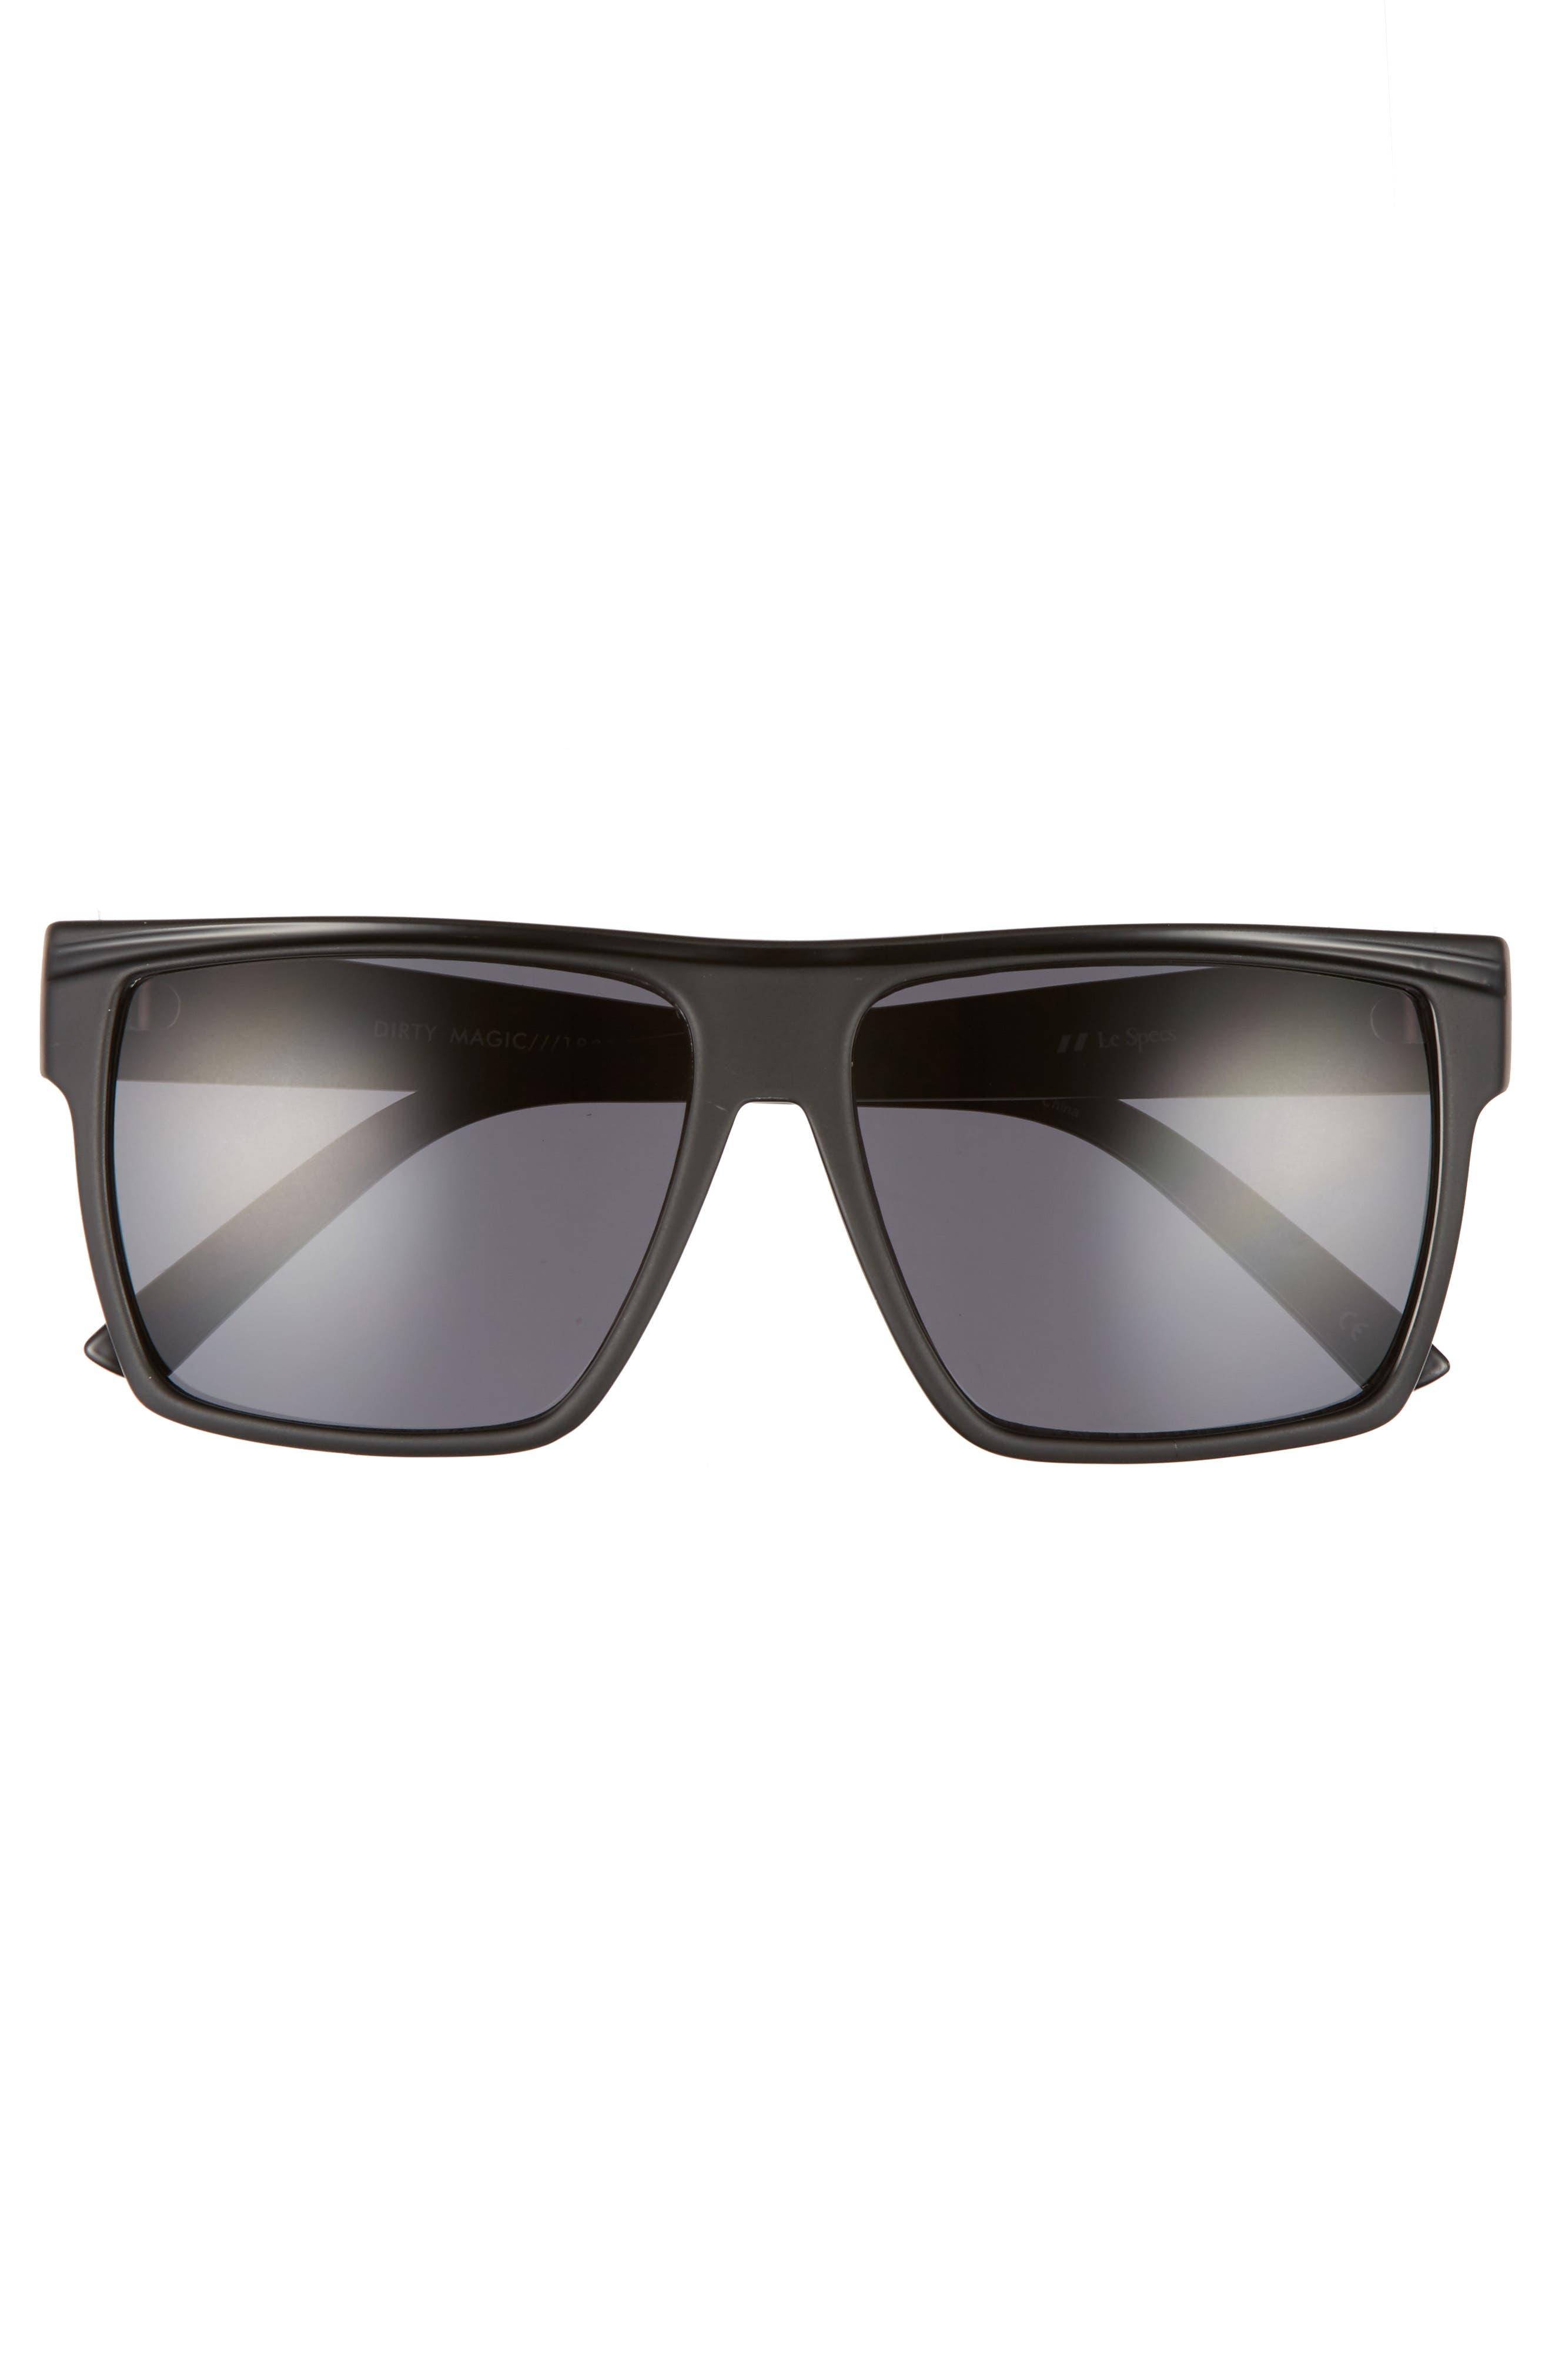 Dirty Magic 56mm Rectangle Sunglasses,                             Alternate thumbnail 3, color,                             Matte Black